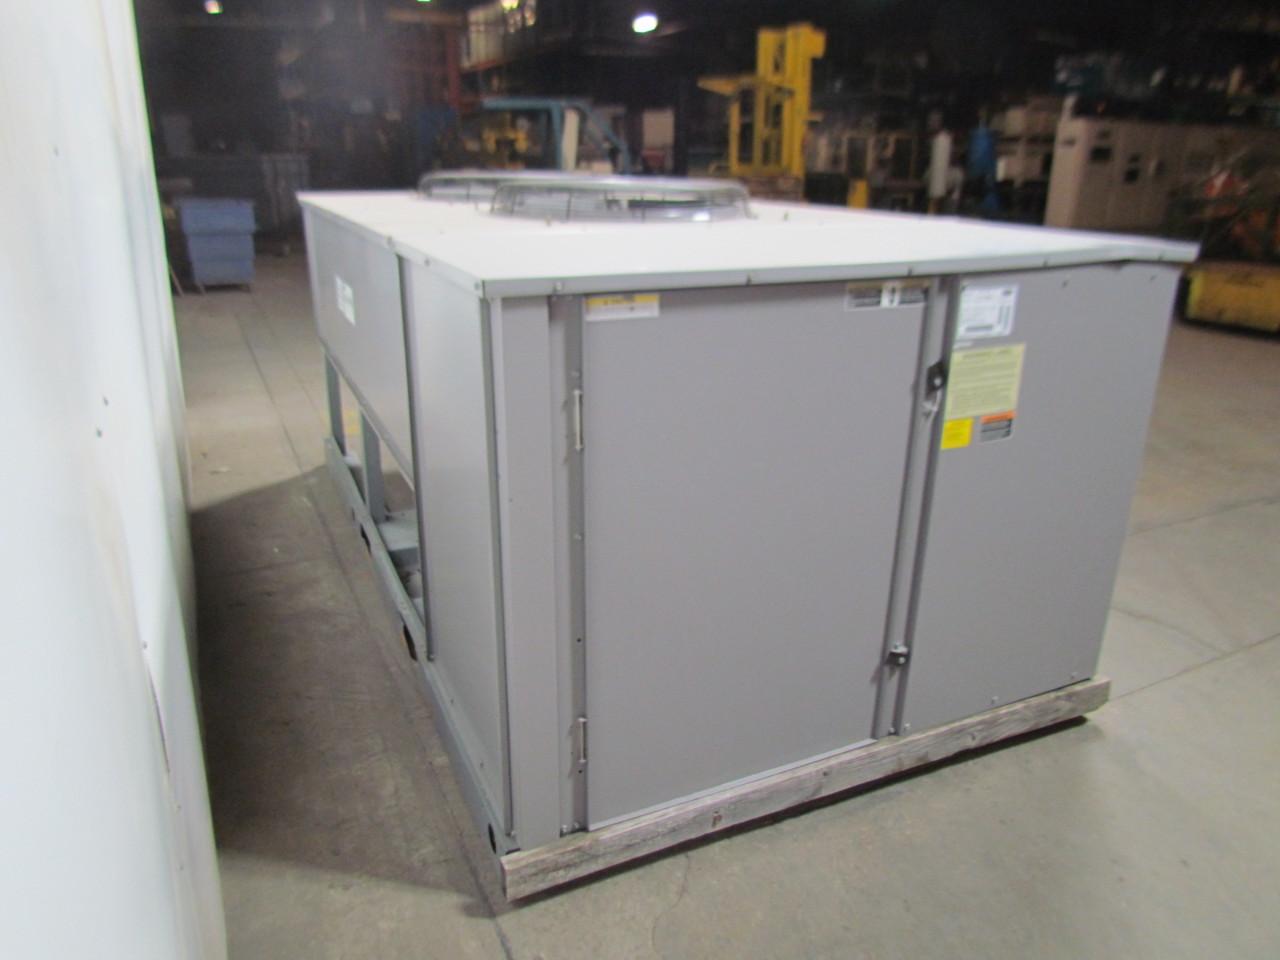 601 Gemini Split 26.7 Ton Commercial Air Cooled Condensing Unit eBay #735F43